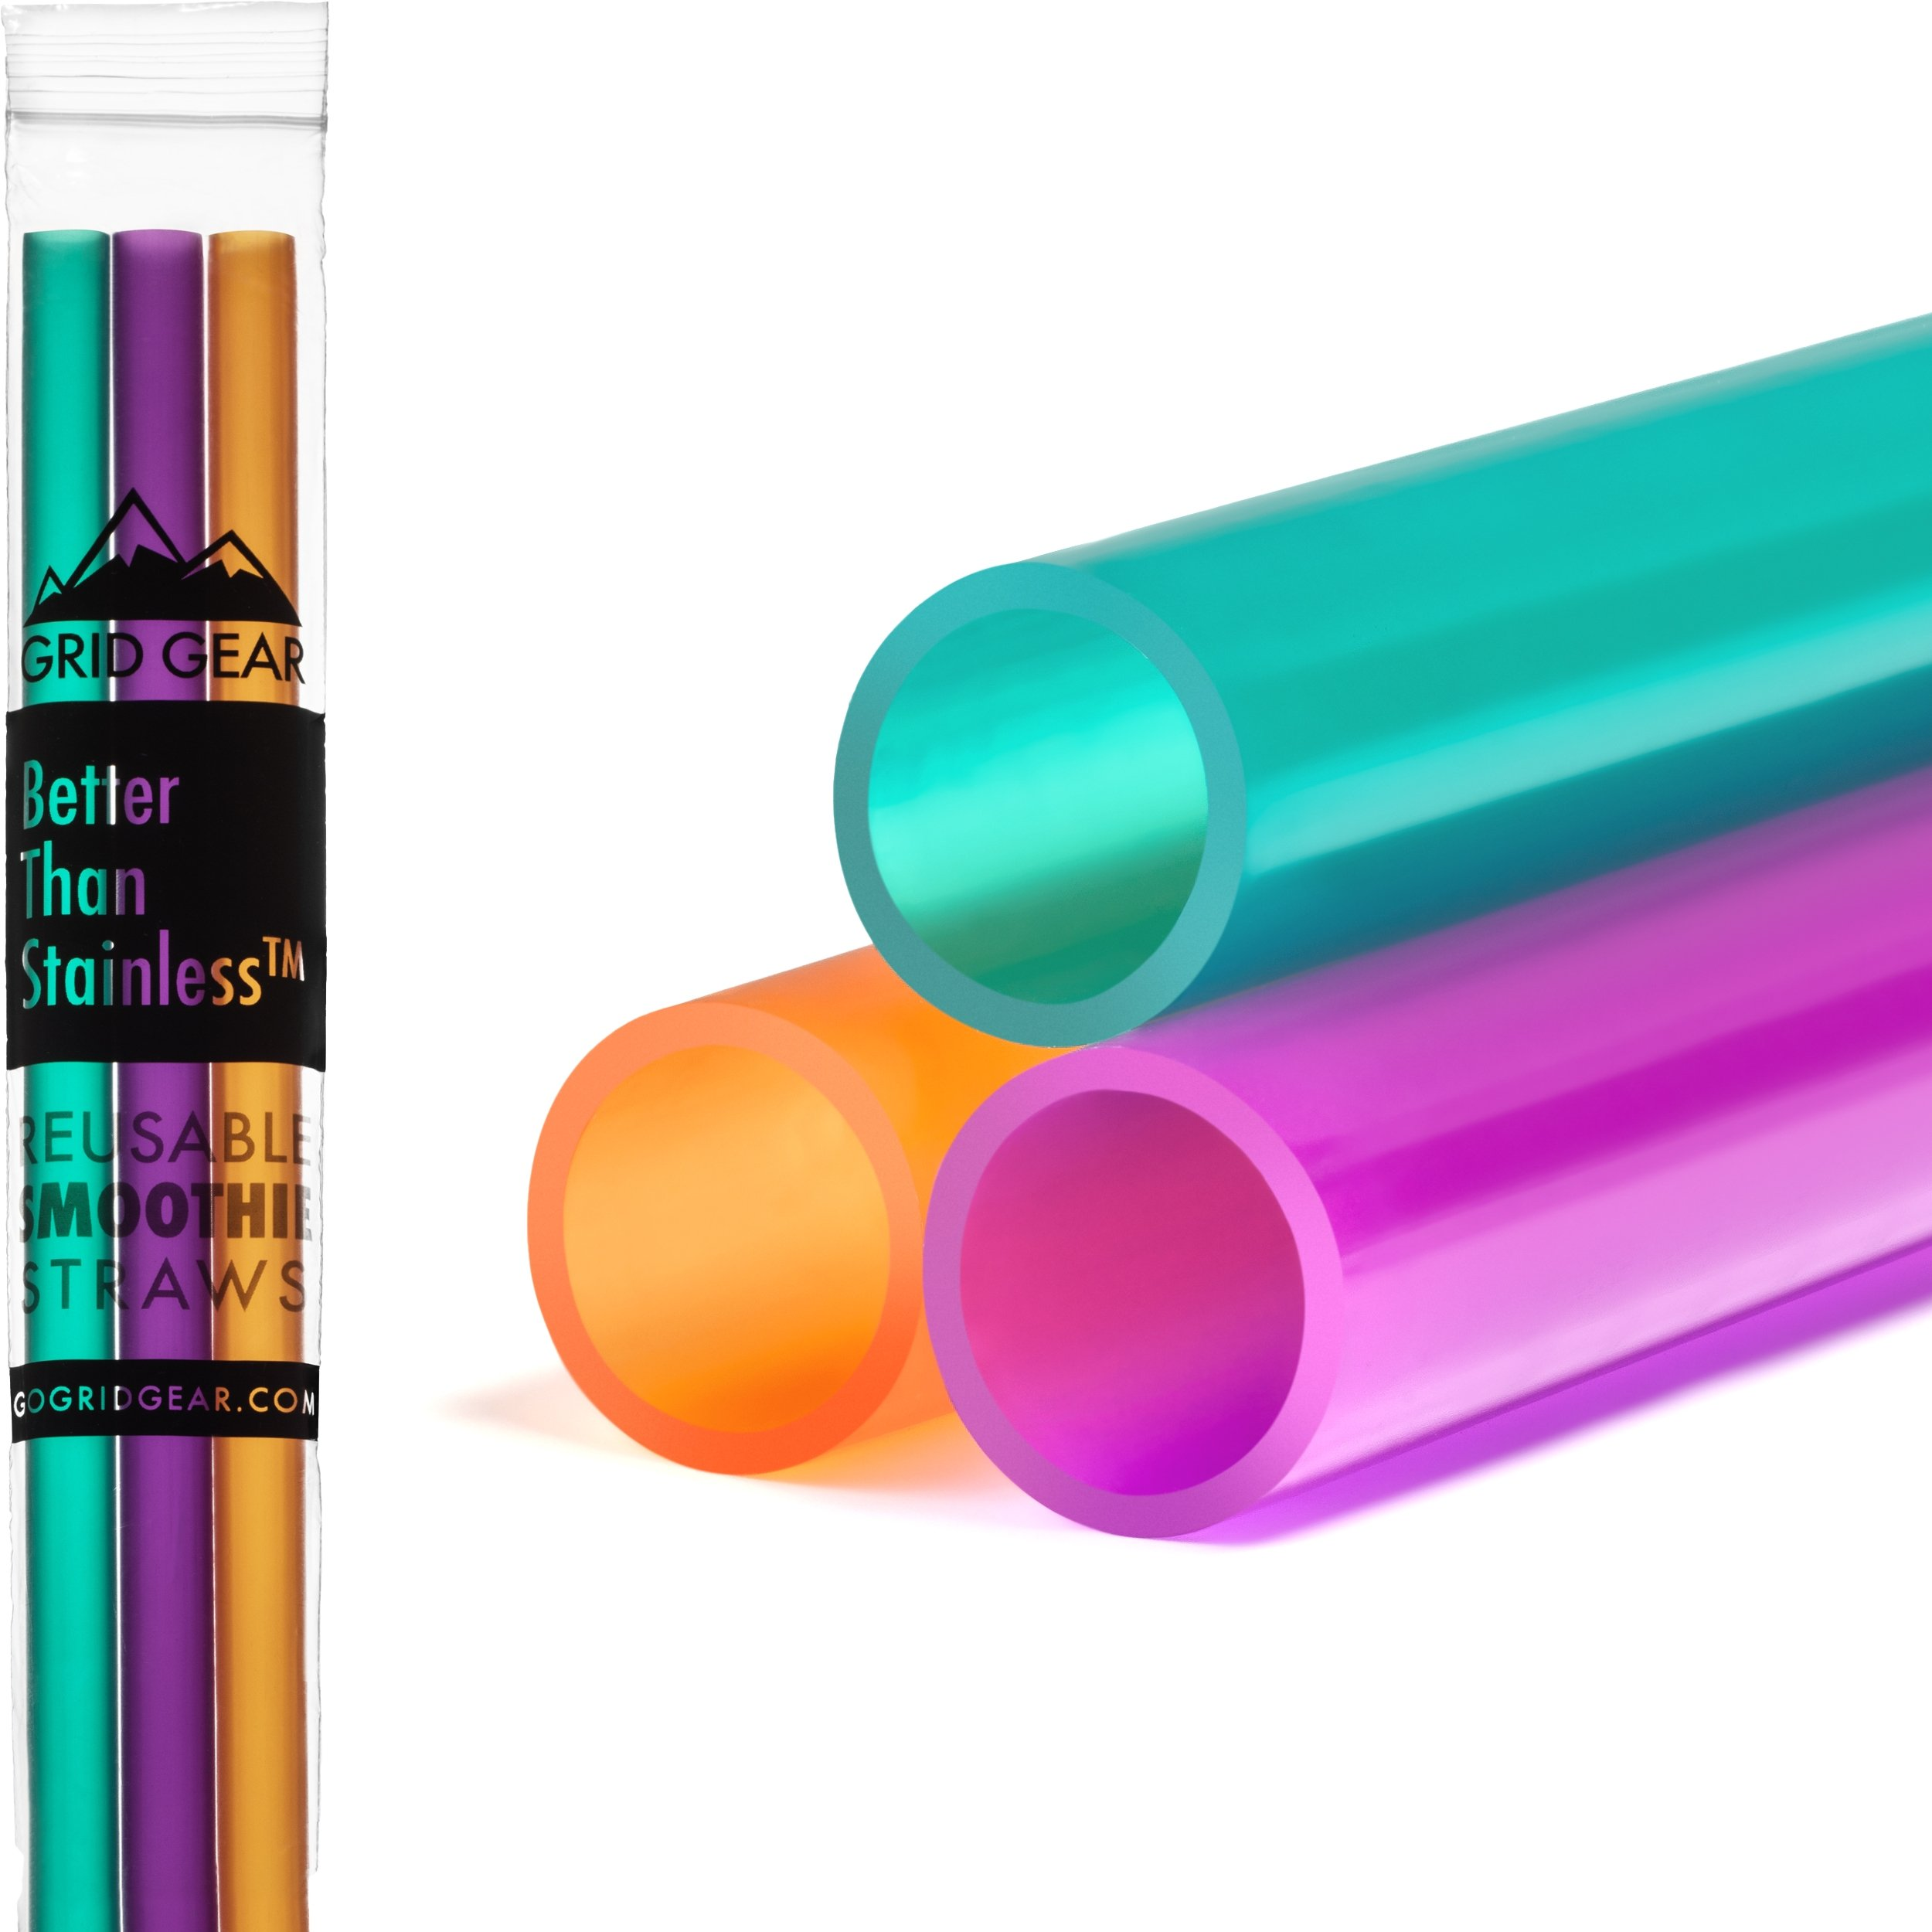 Reusable Smoothie Straws - Great for Milkshakes, Bubble & Boba Tea - 3-pack